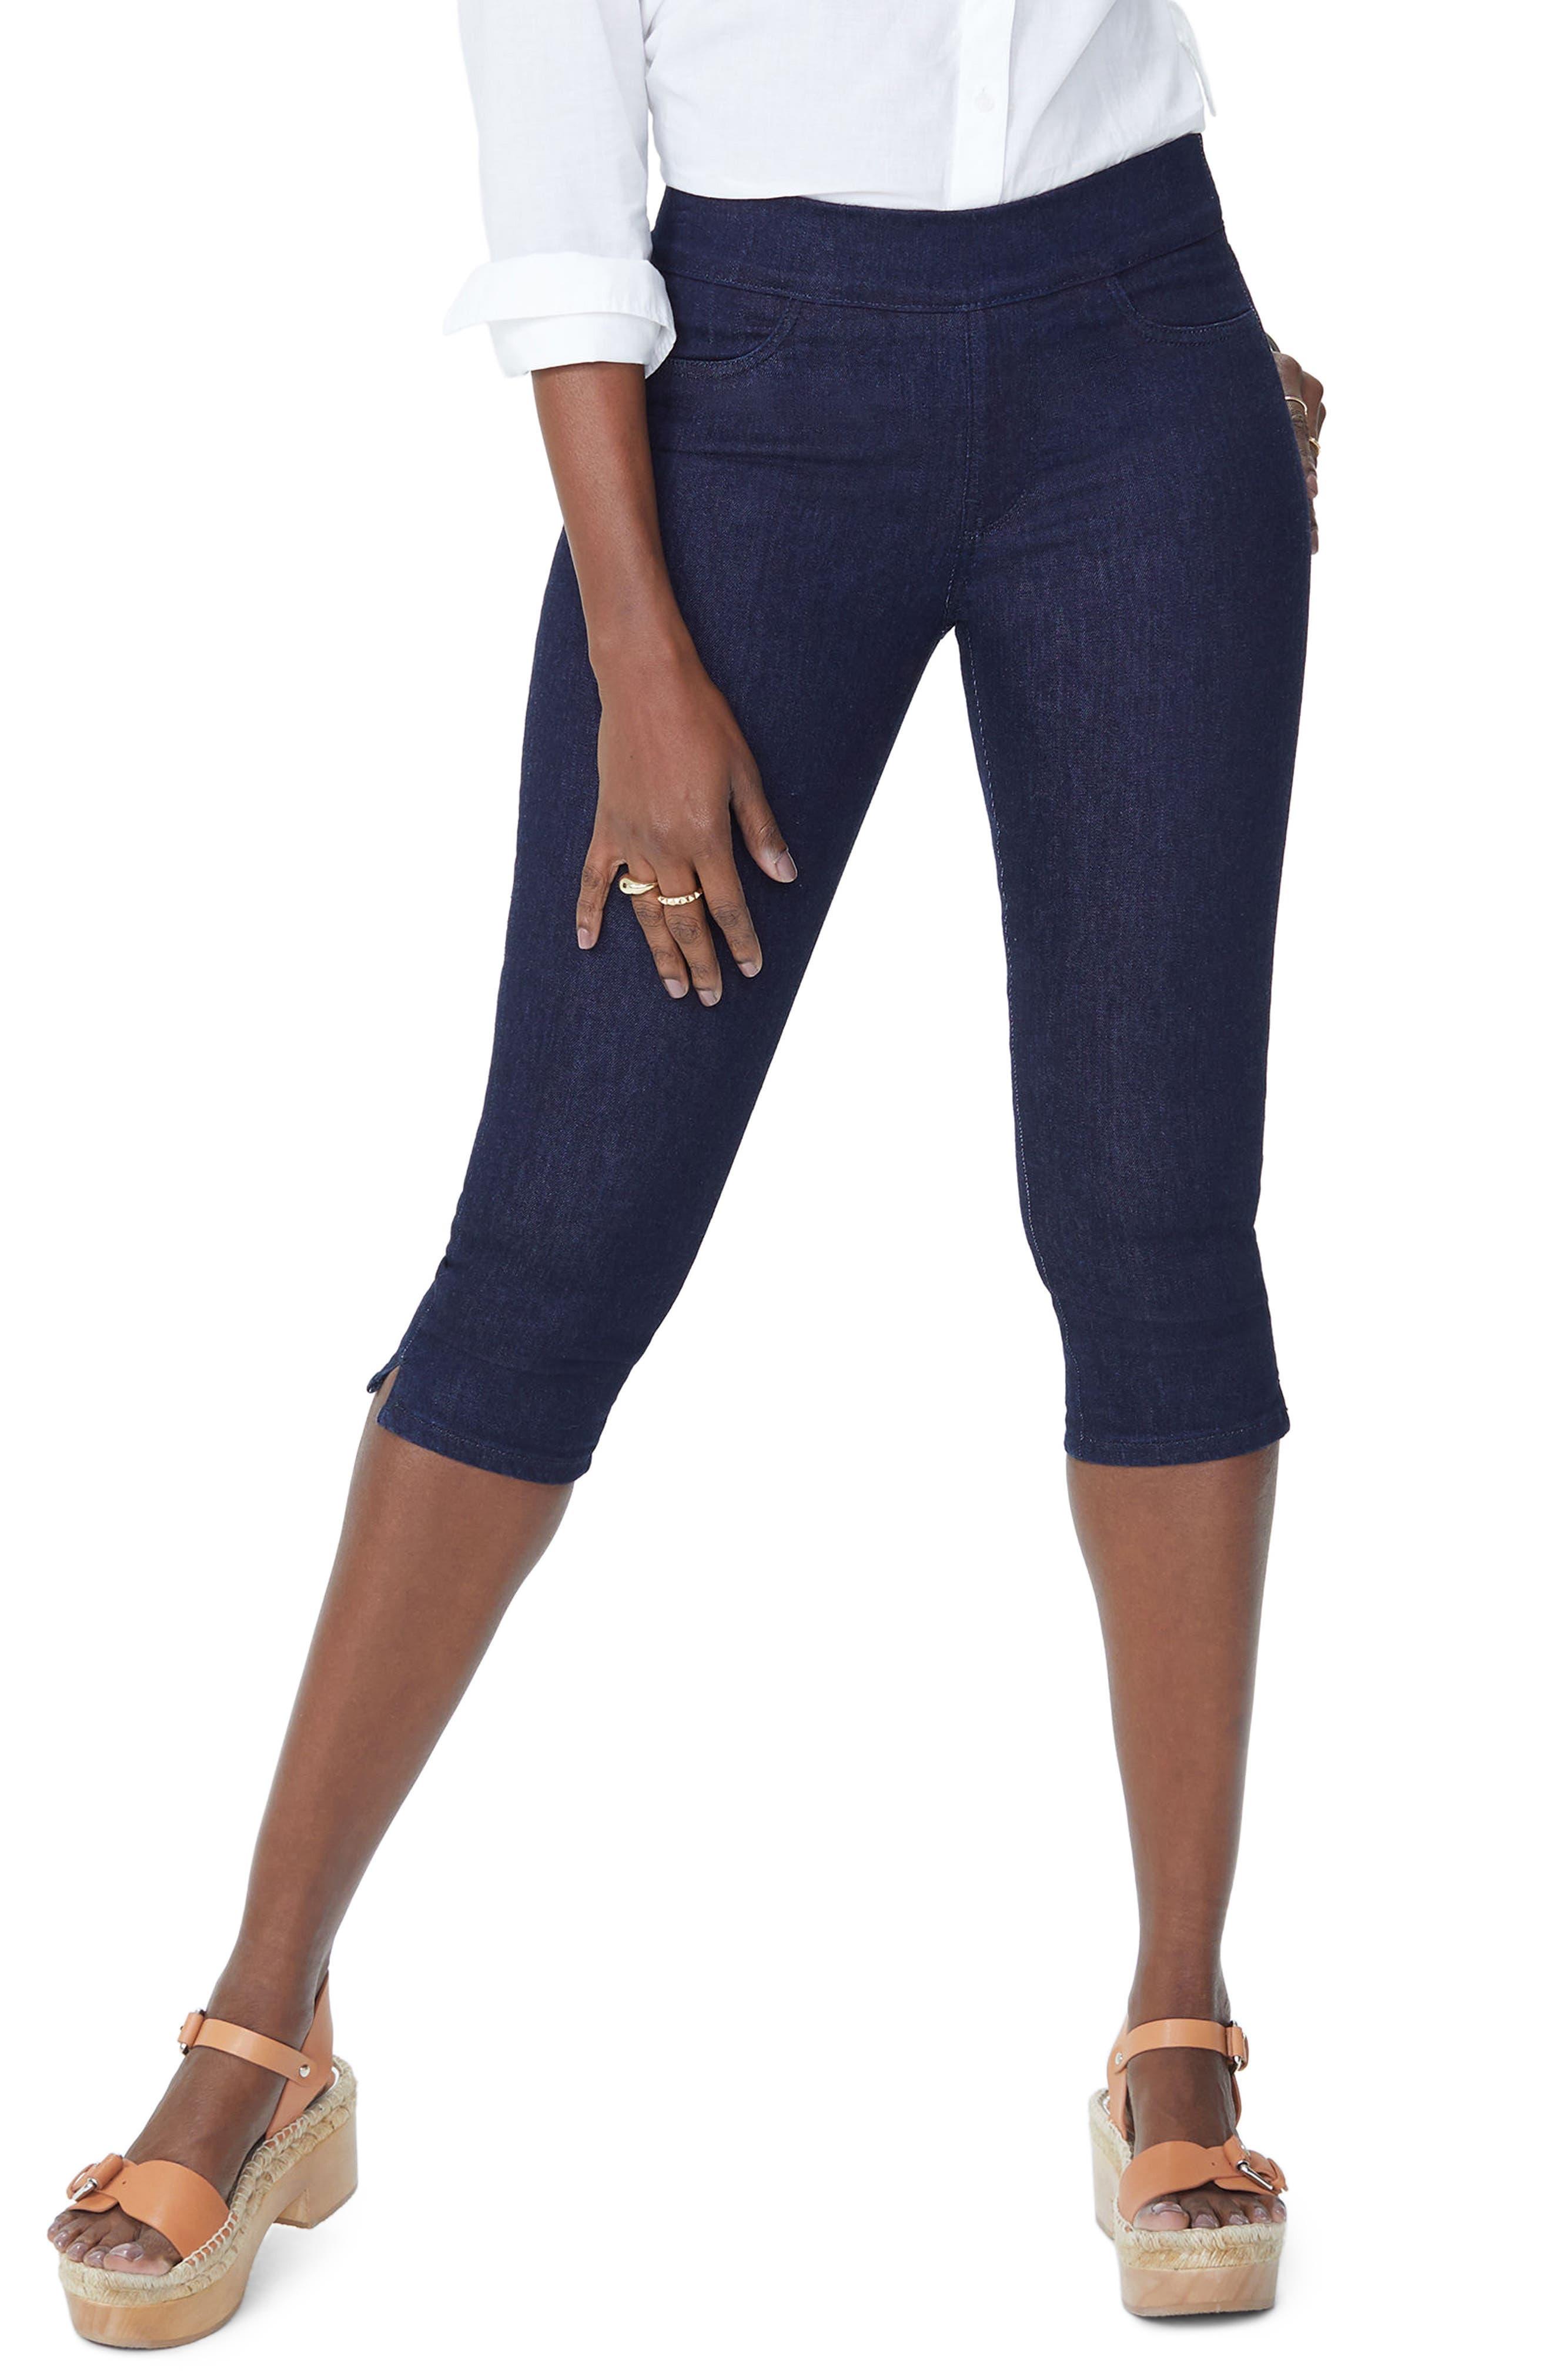 High Waist Pull-On Stretch Skinny Capri Jeans,                             Main thumbnail 1, color,                             408